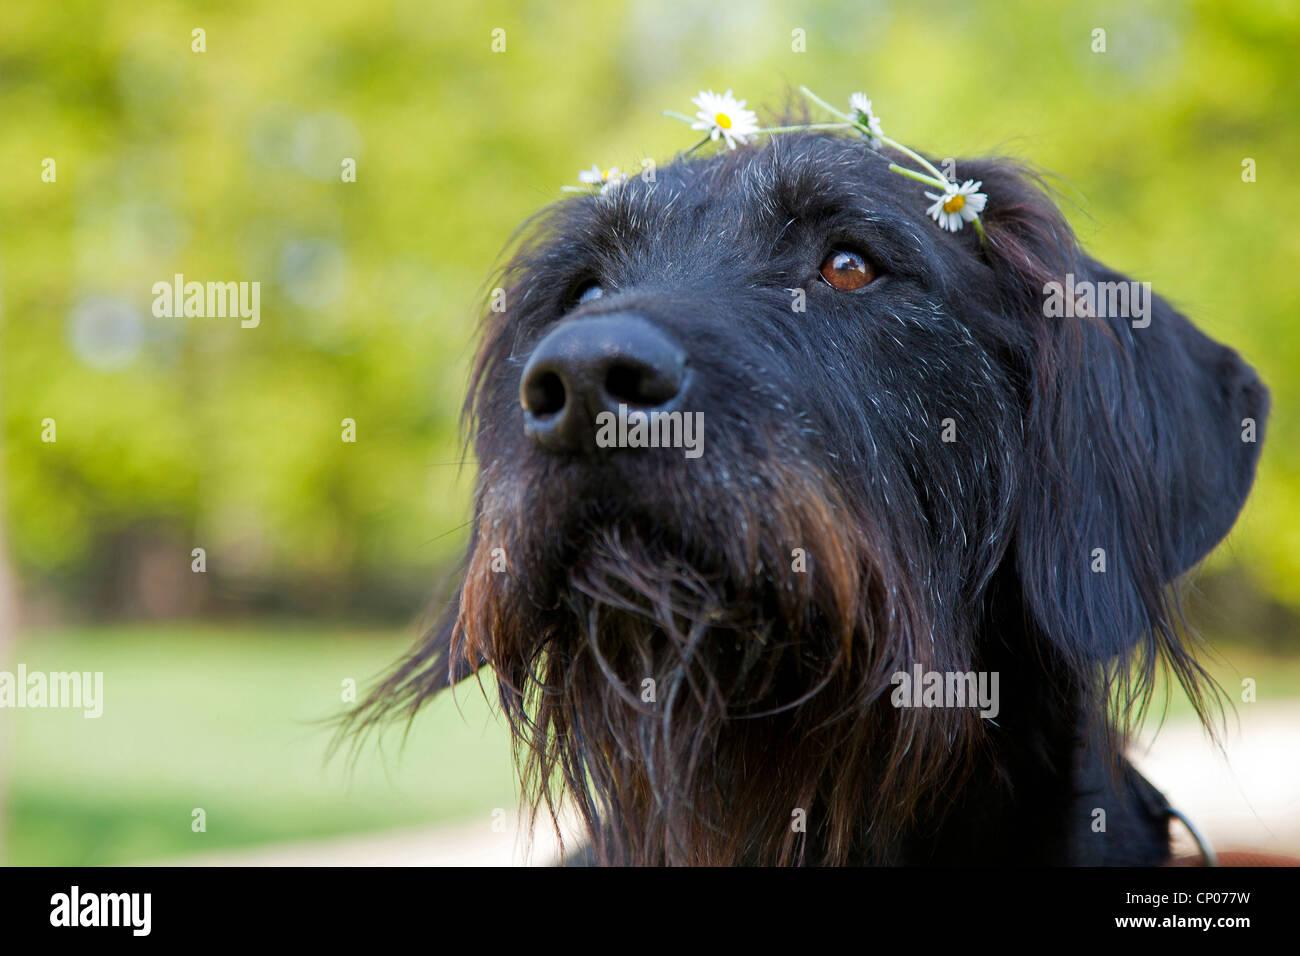 Giant Schnauzer (Canis lupus f. familiaris), portrait of giant schnauzer mongrel with flower garland, Germany Stock Photo